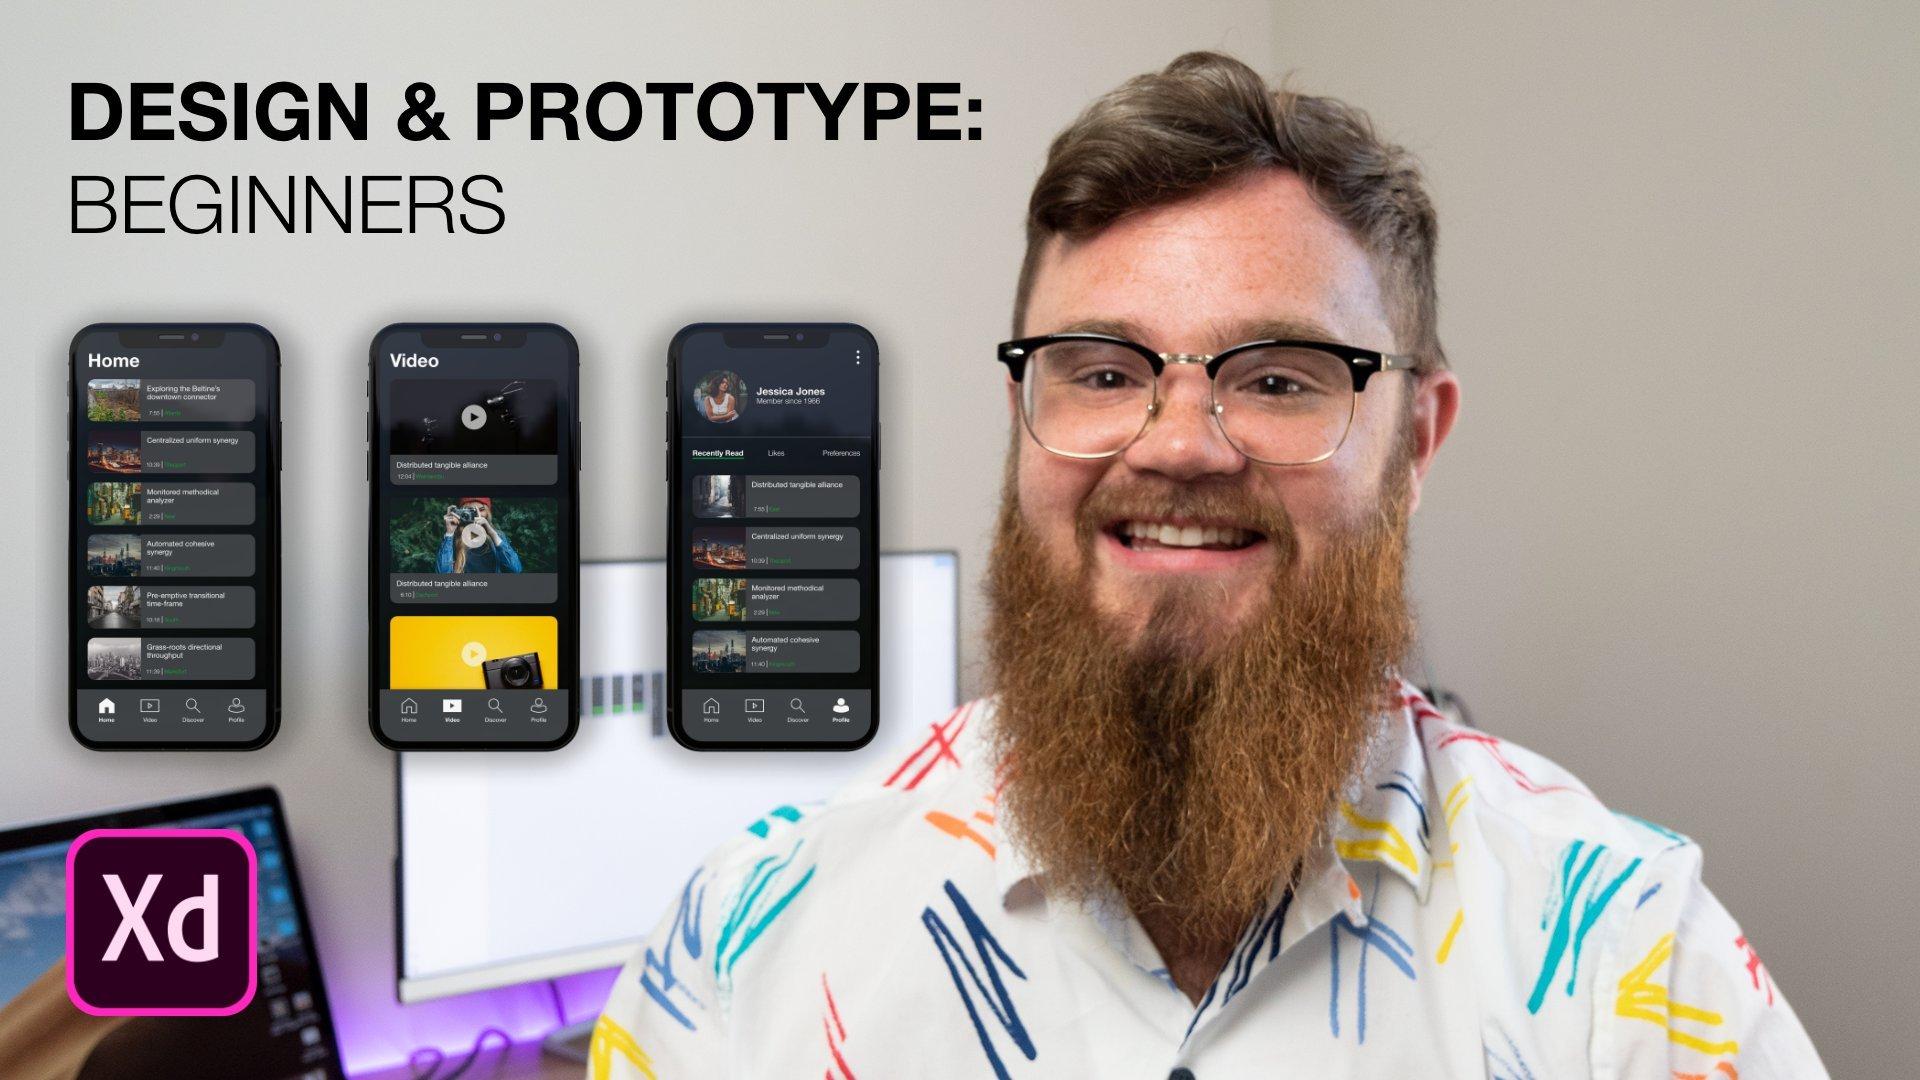 Adobe XD: App Design & Prototyping for Beginners